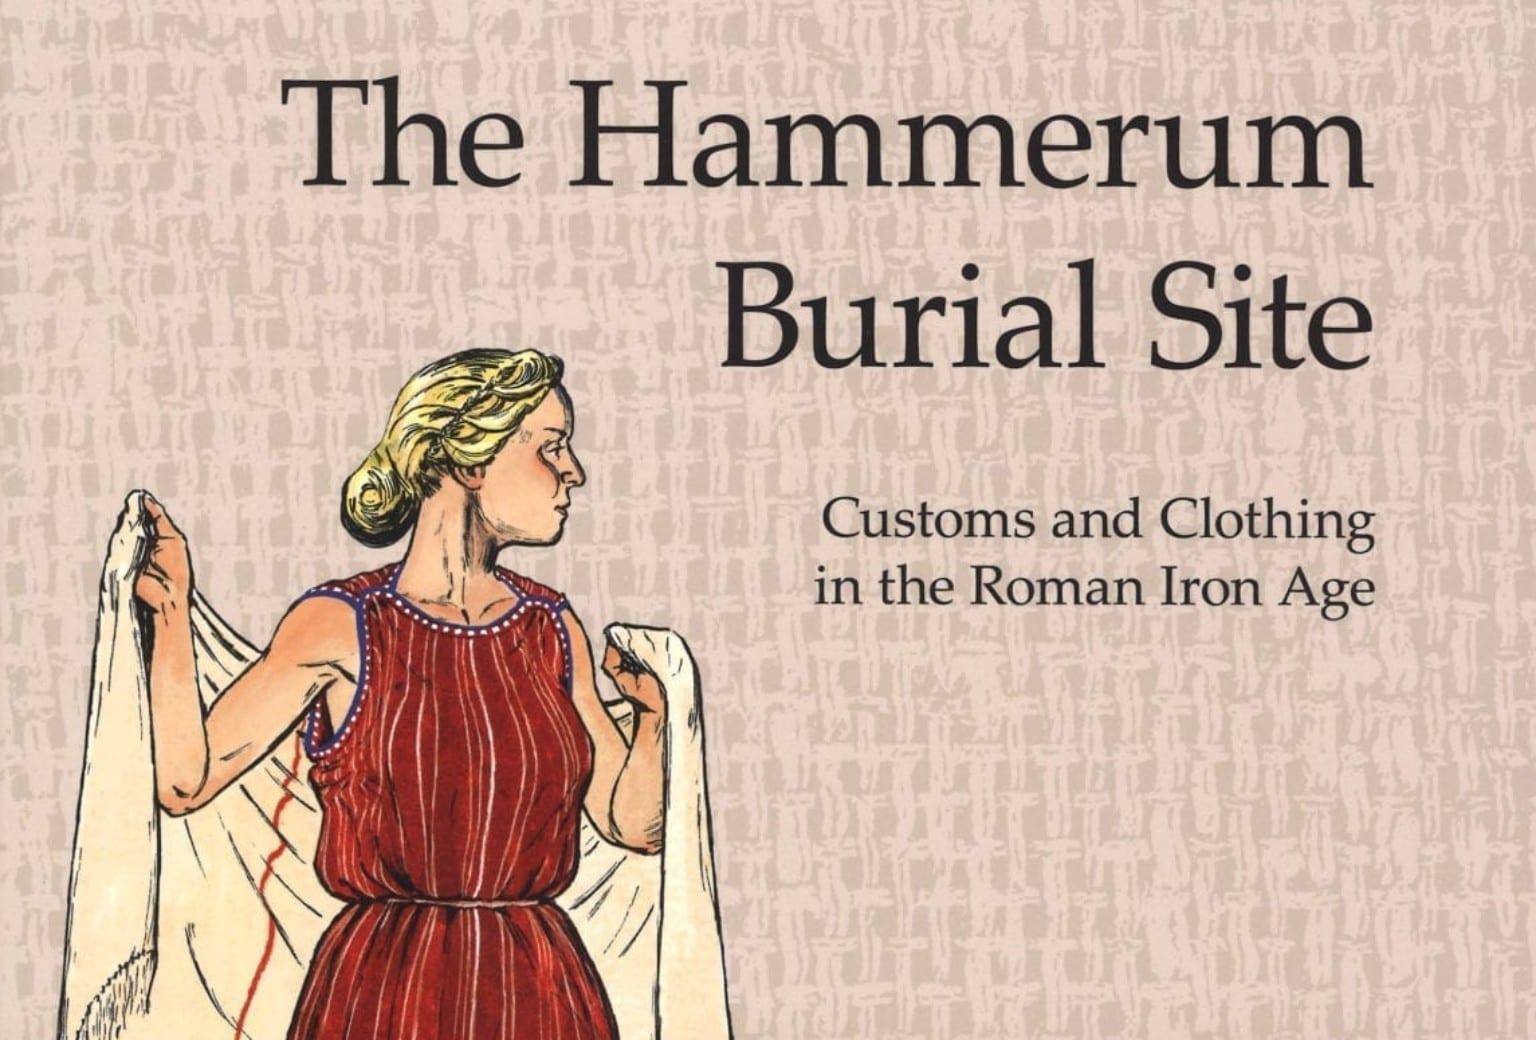 Bogudgivelse The Hammerum Burial Site